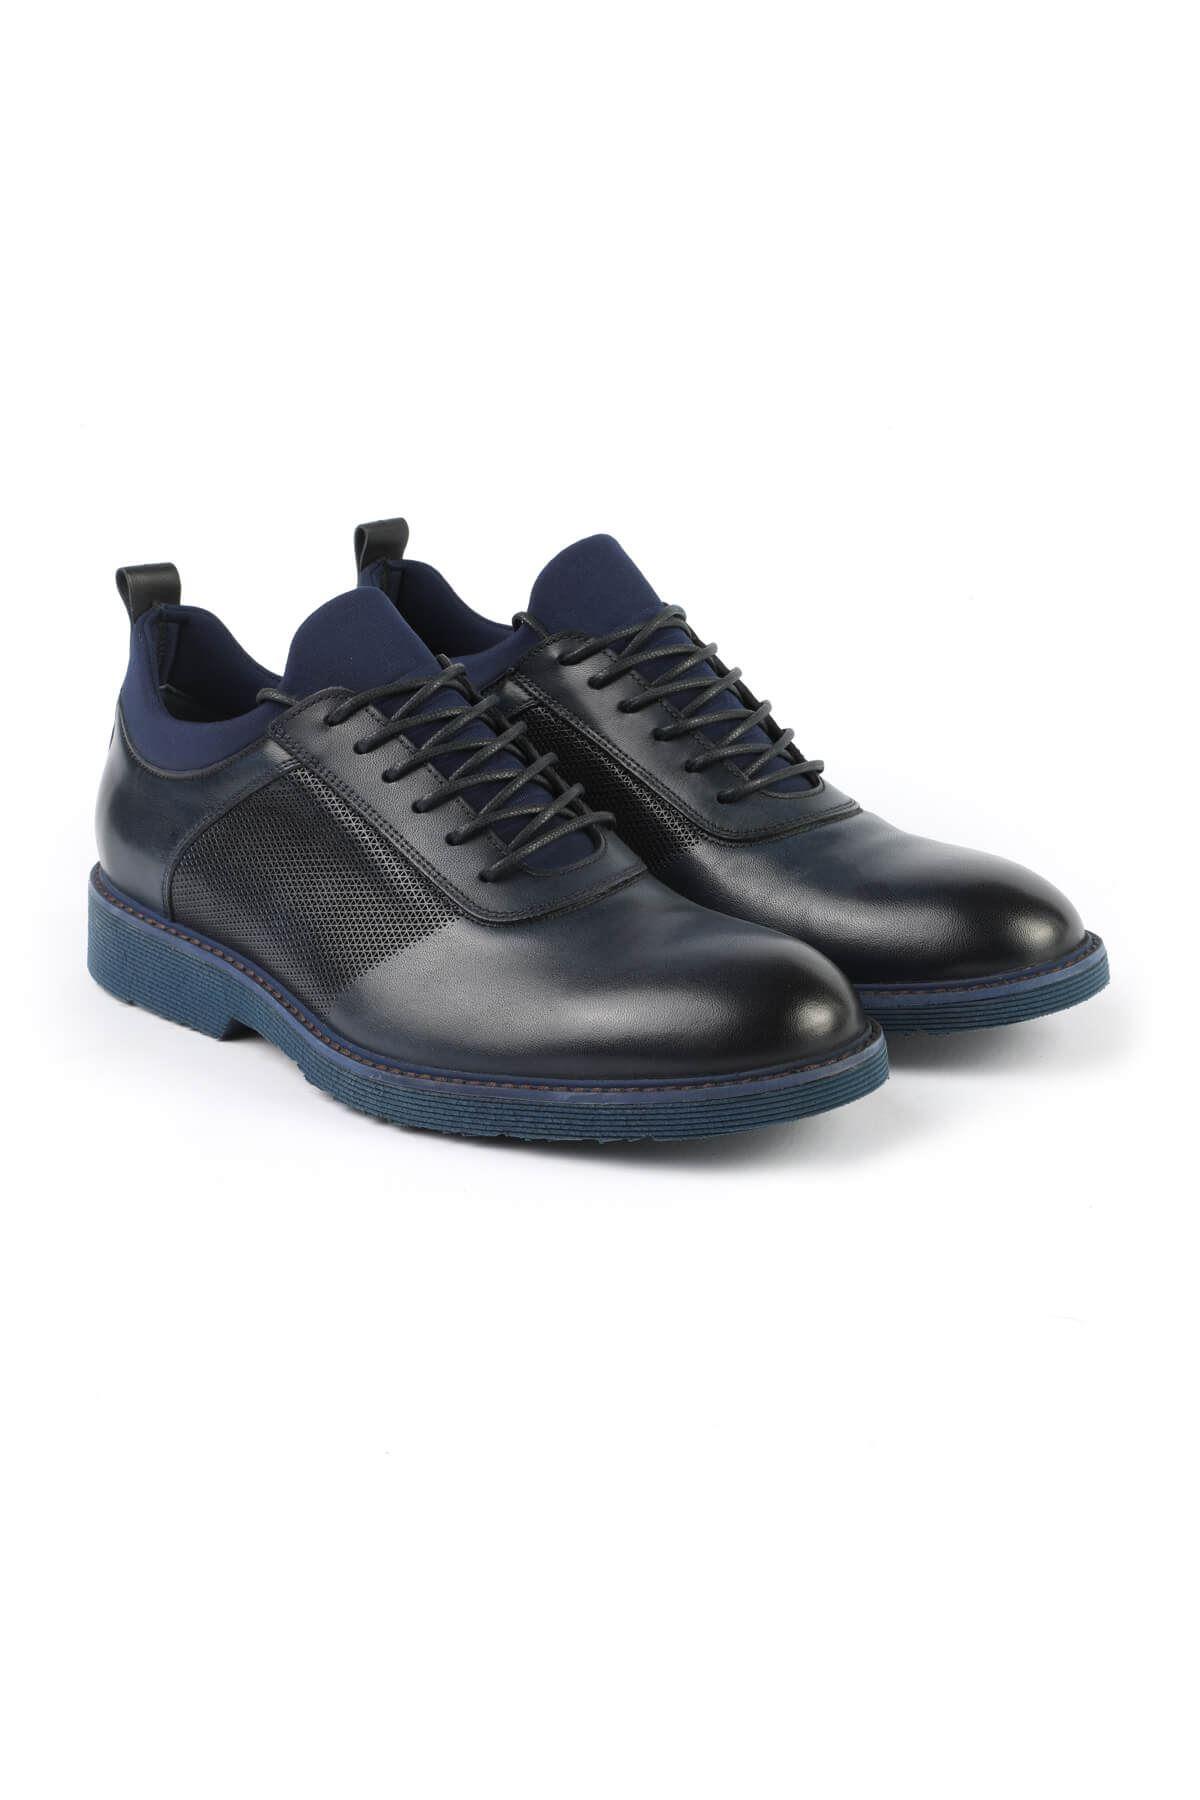 Libero 2999 Navy Blue Casual Shoes